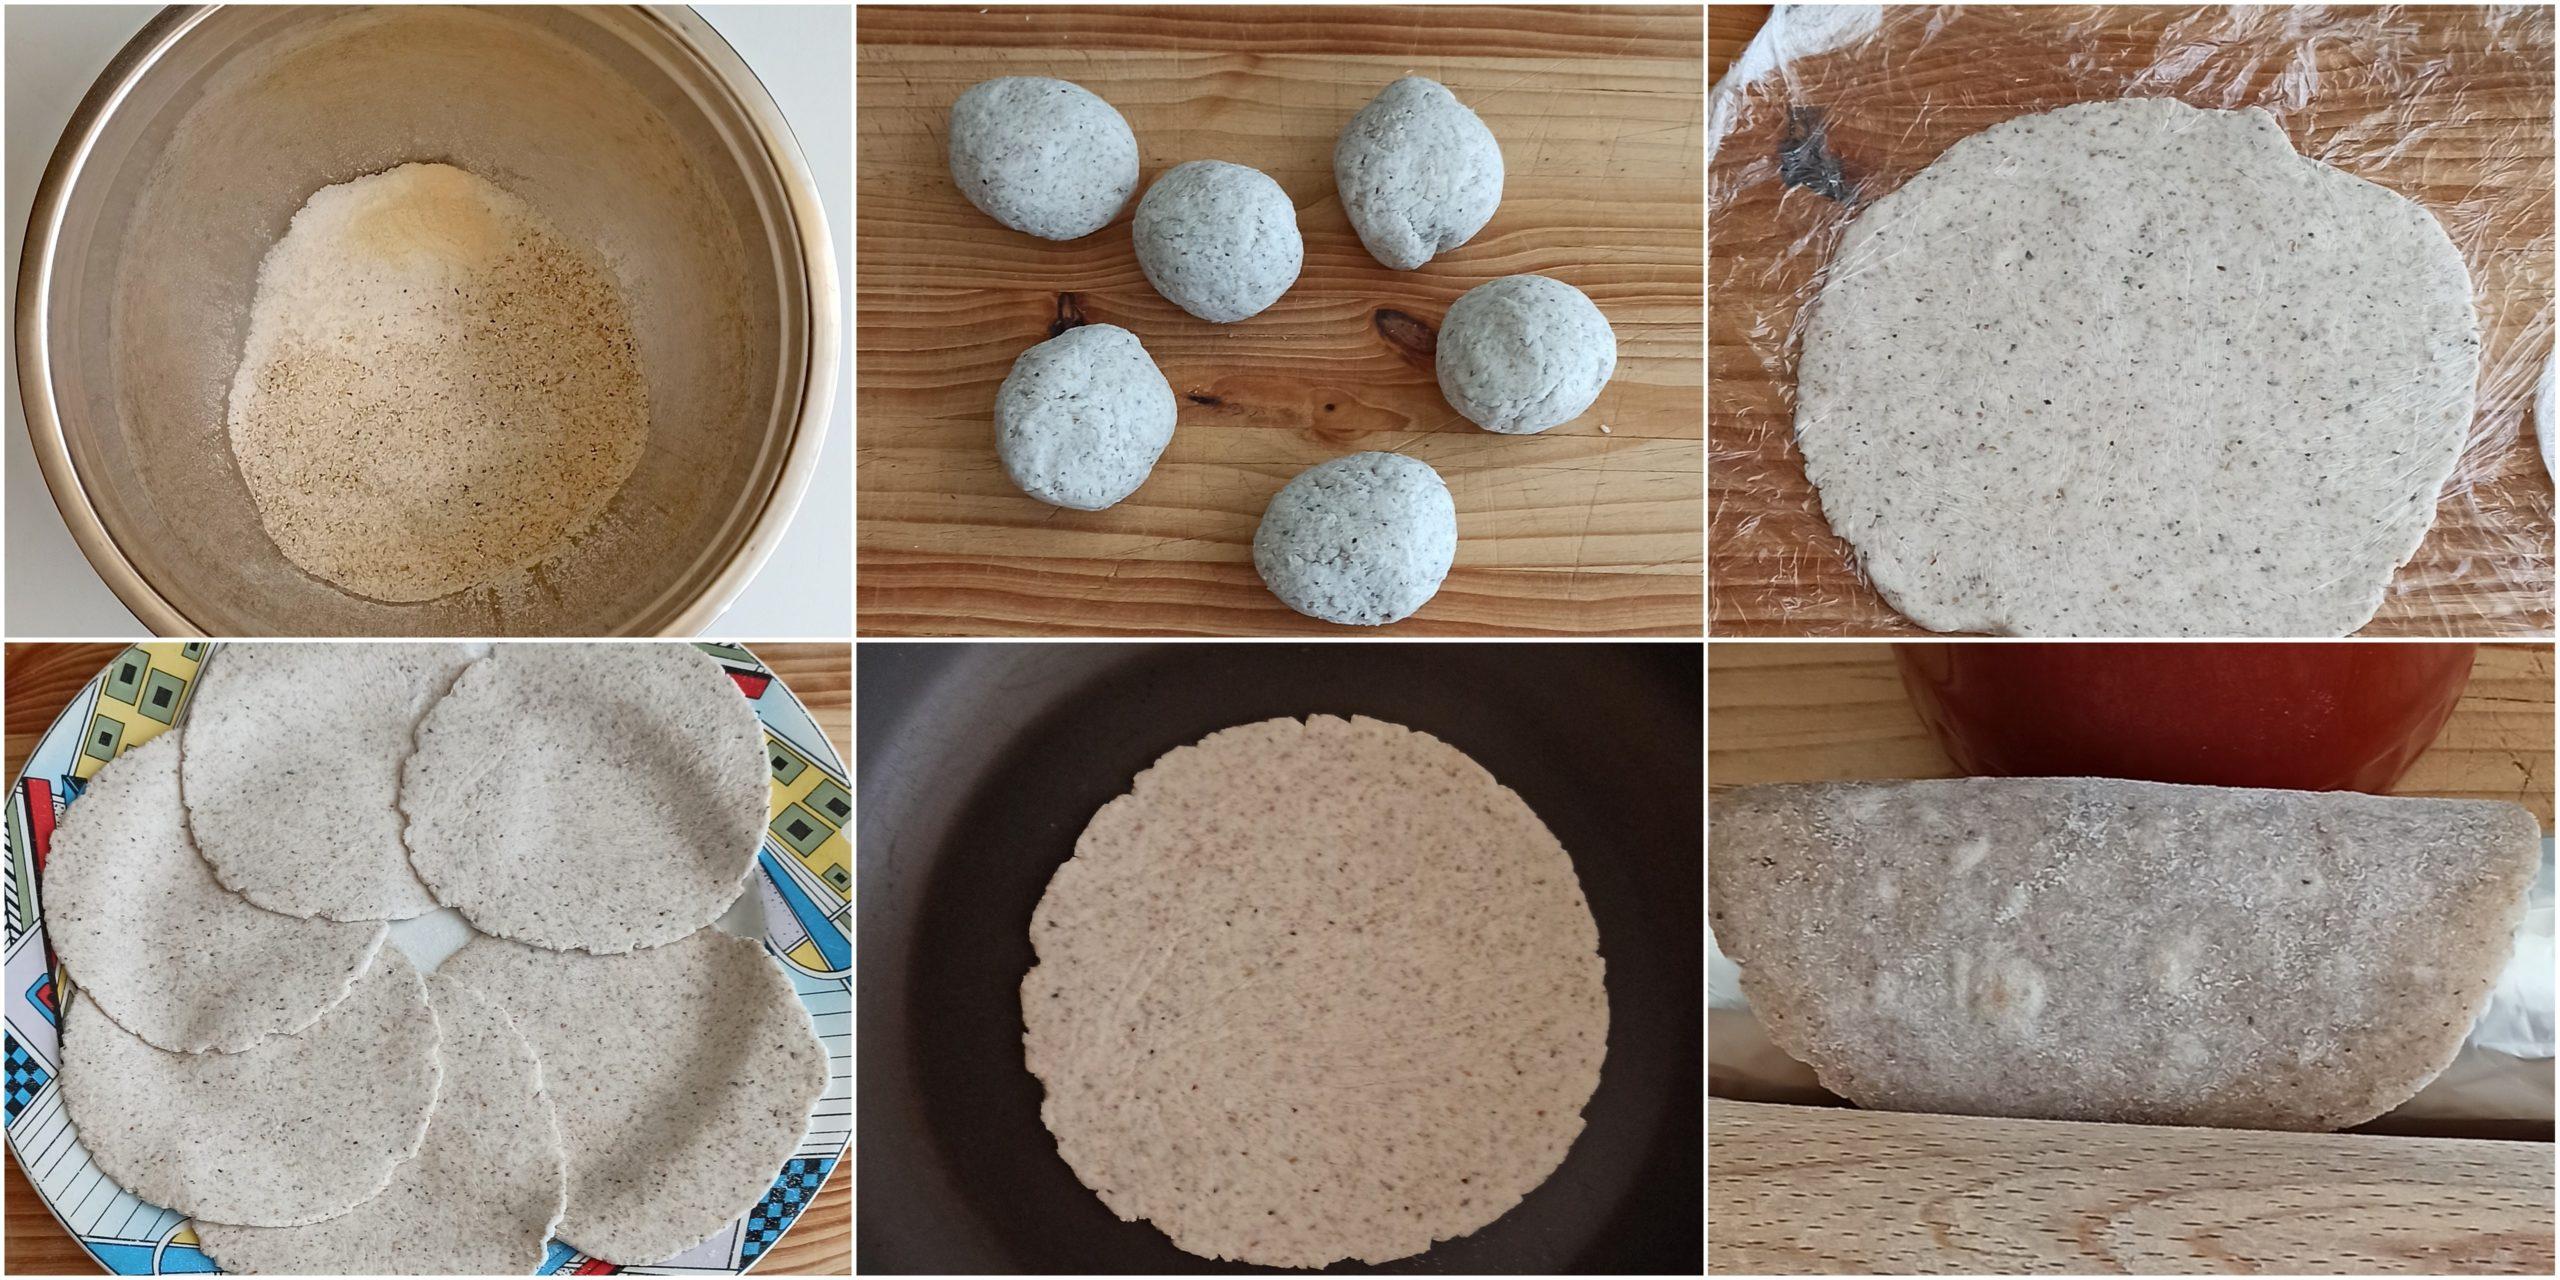 Finti tacos senza glutine al grano saraceno - La Cassata Celiaca